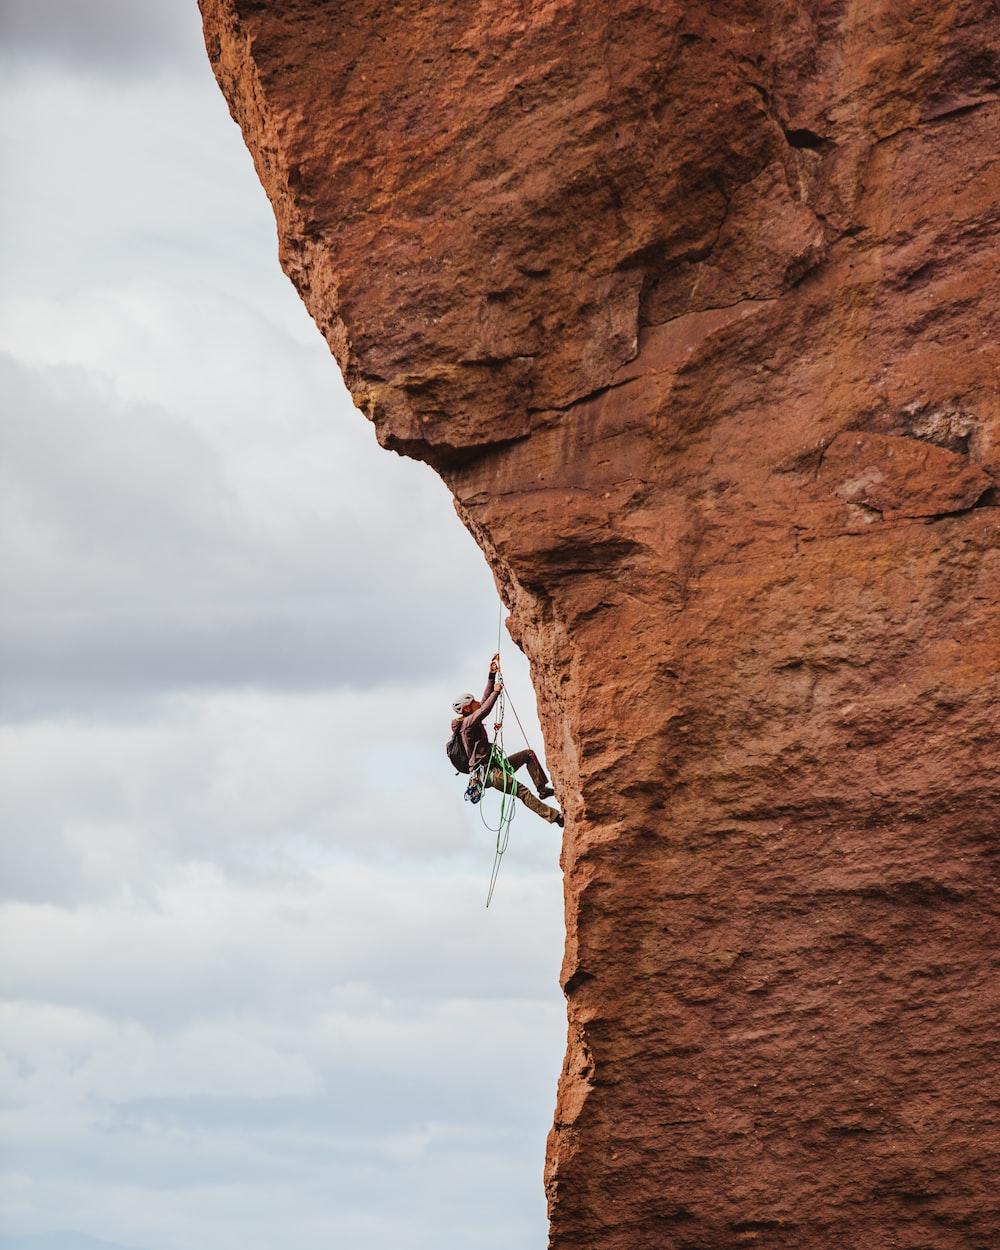 man in black shorts climbing brown rock formation during daytime